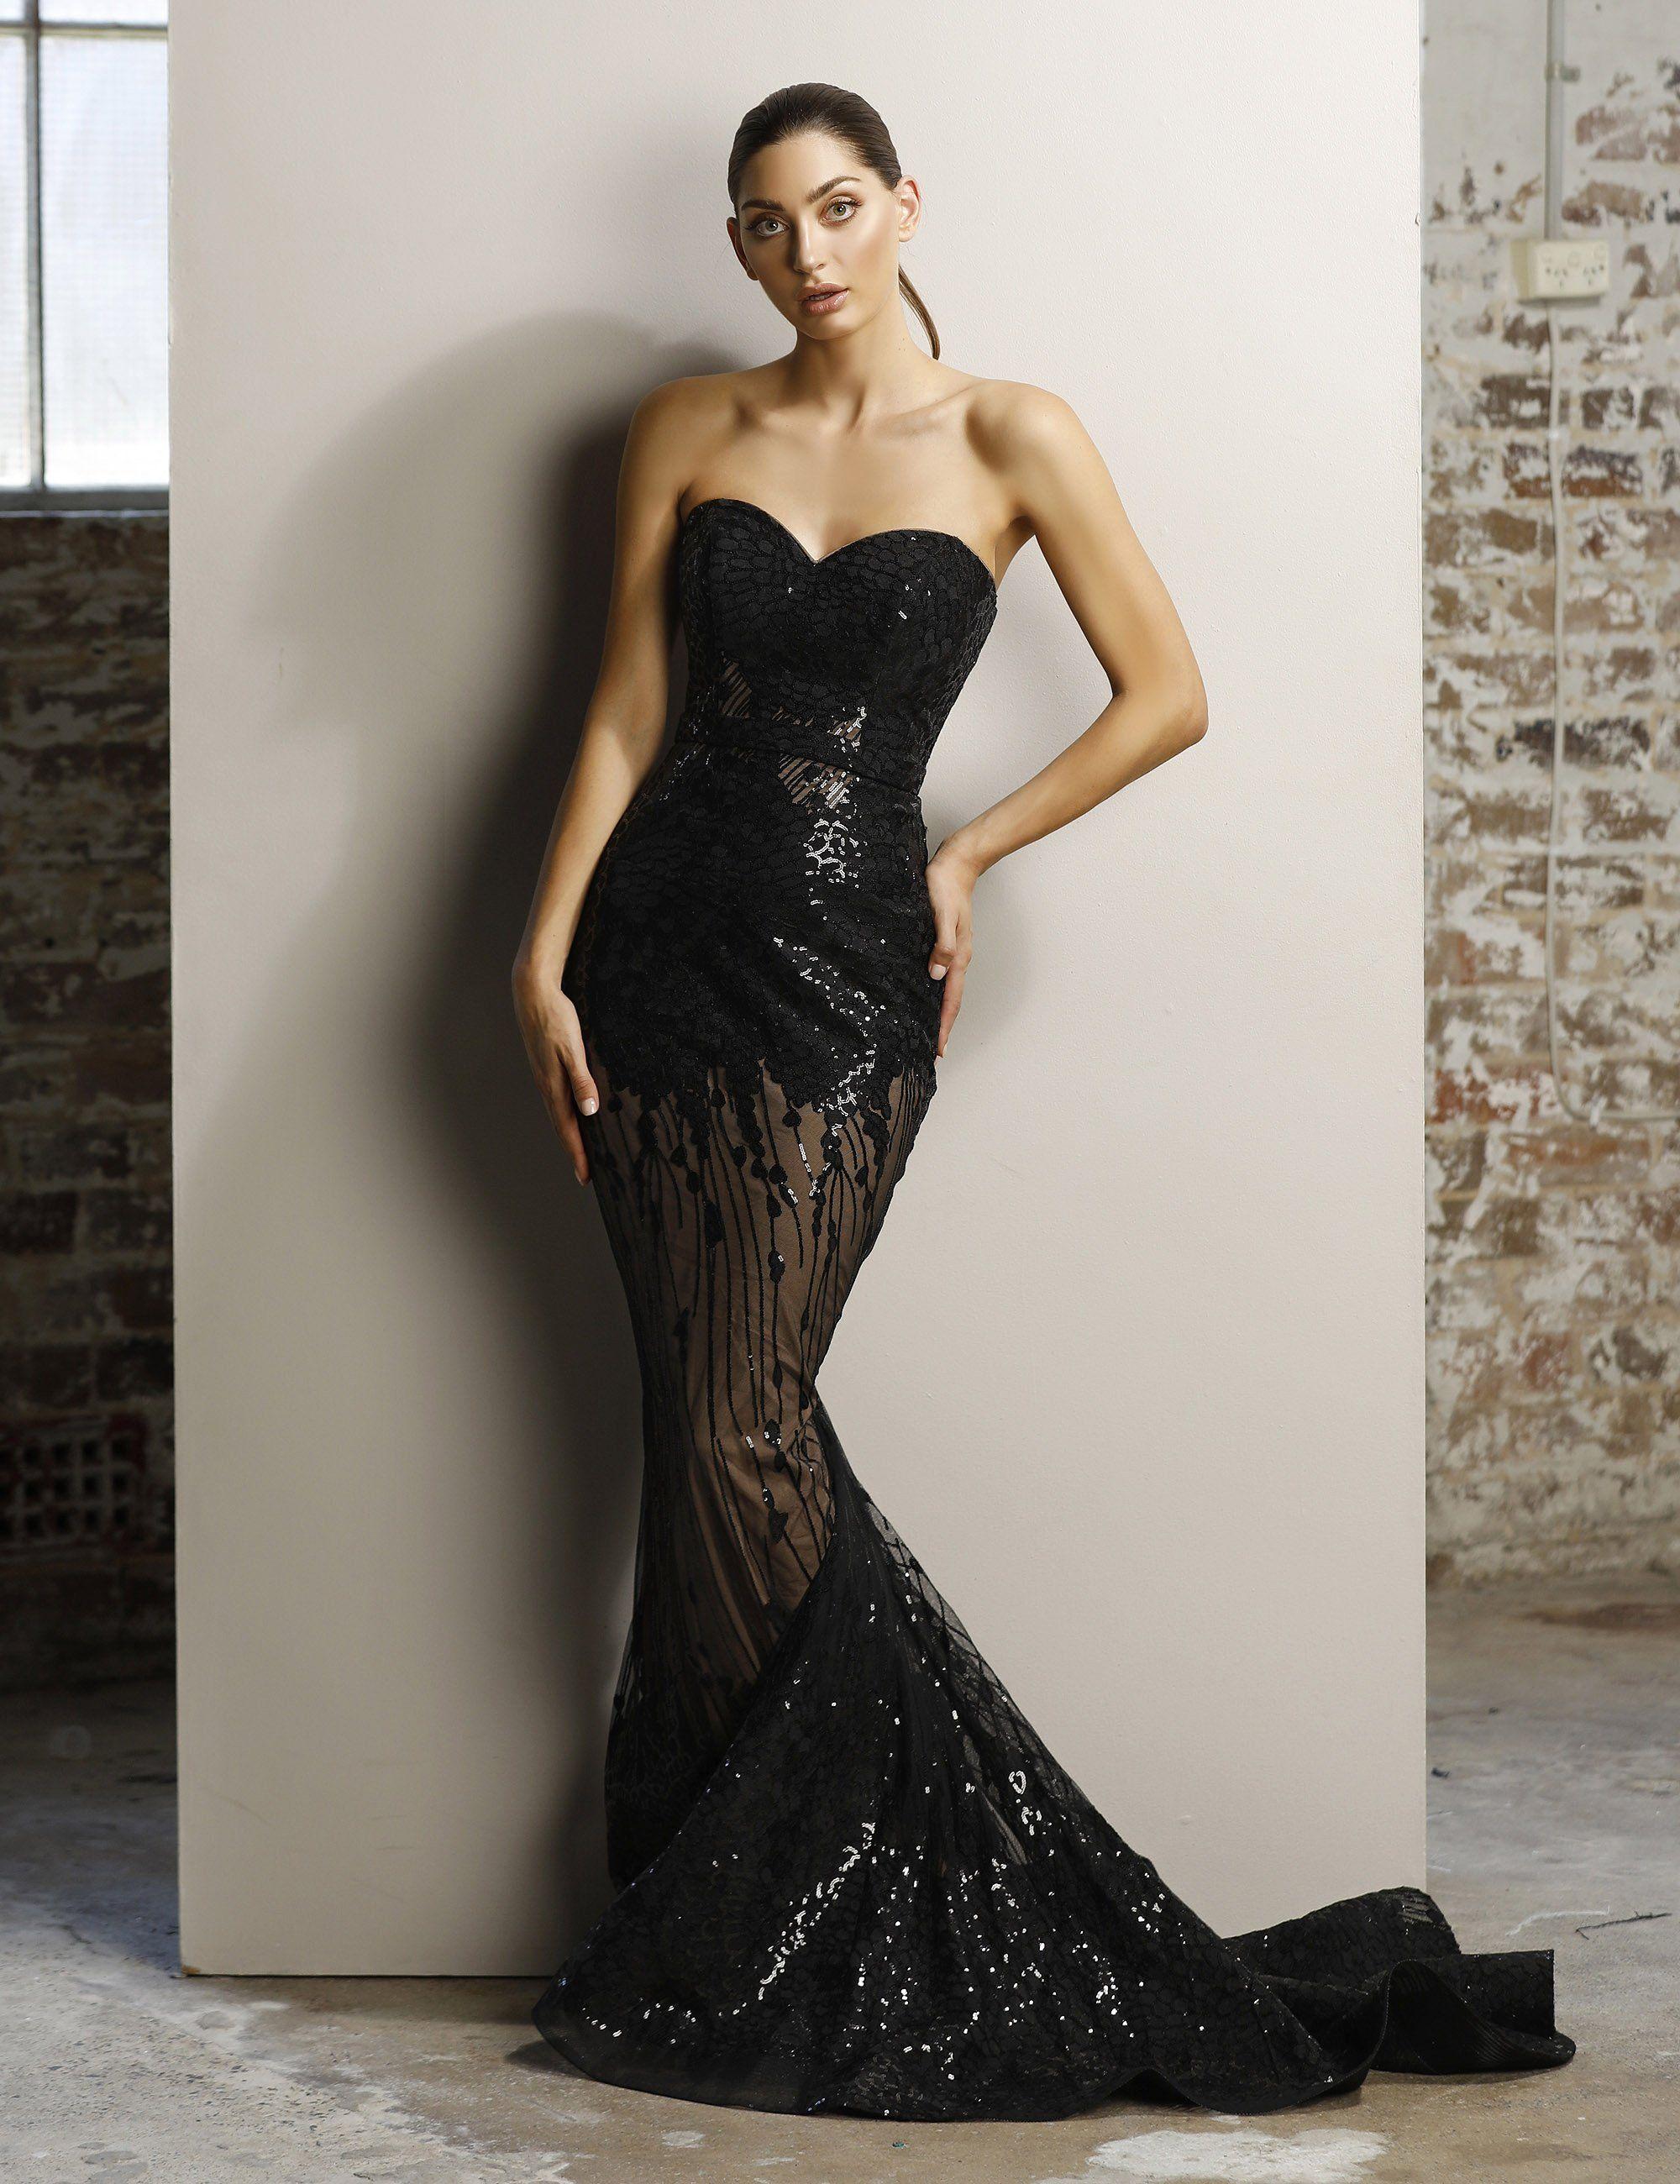 Jx formal wear pinterest stunning dresses boutique and